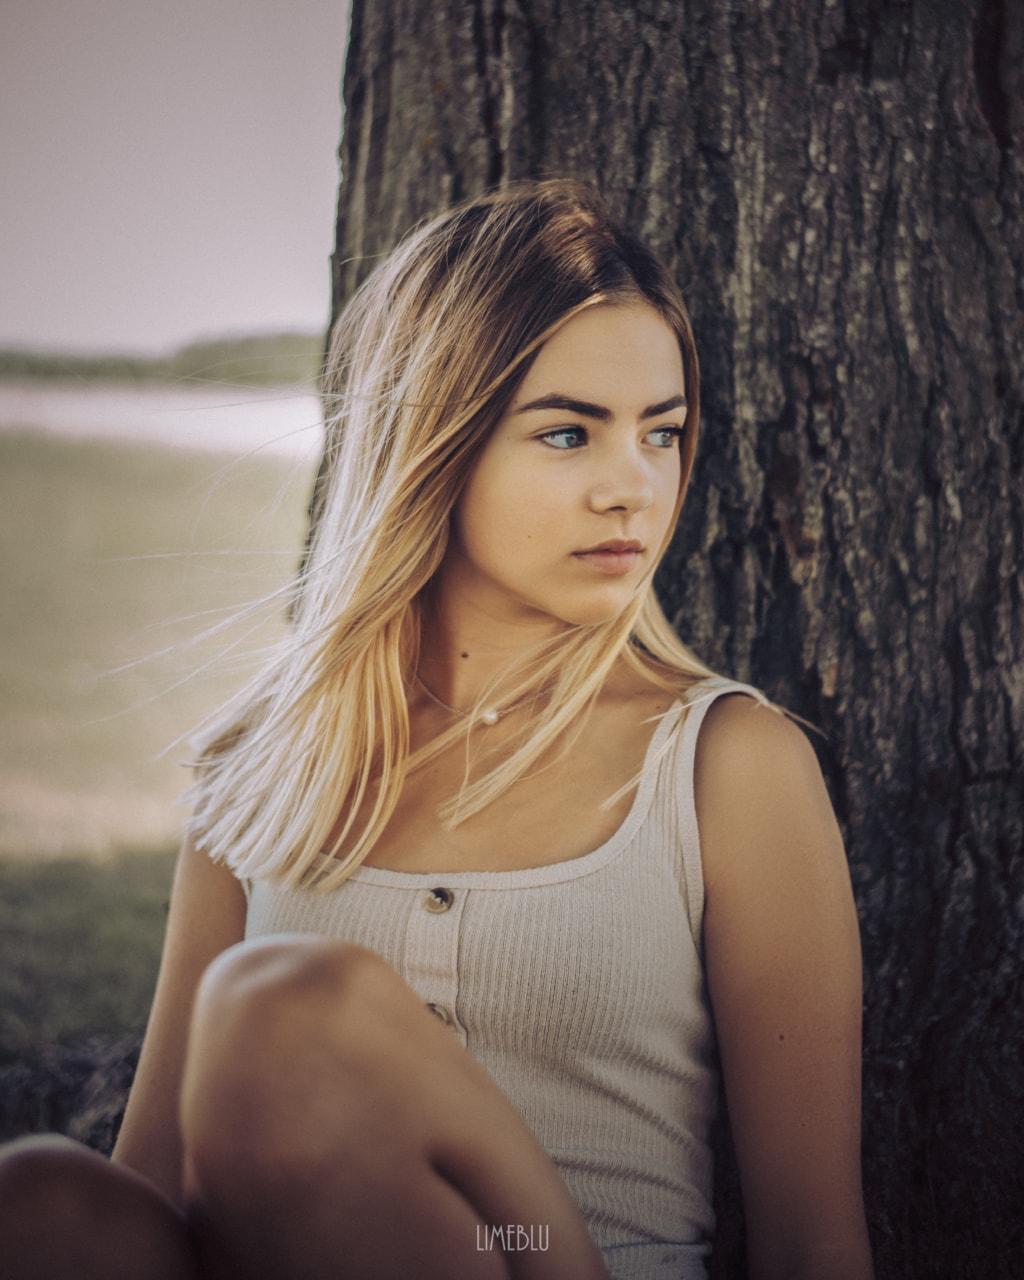 Abby via LimebluPhotography